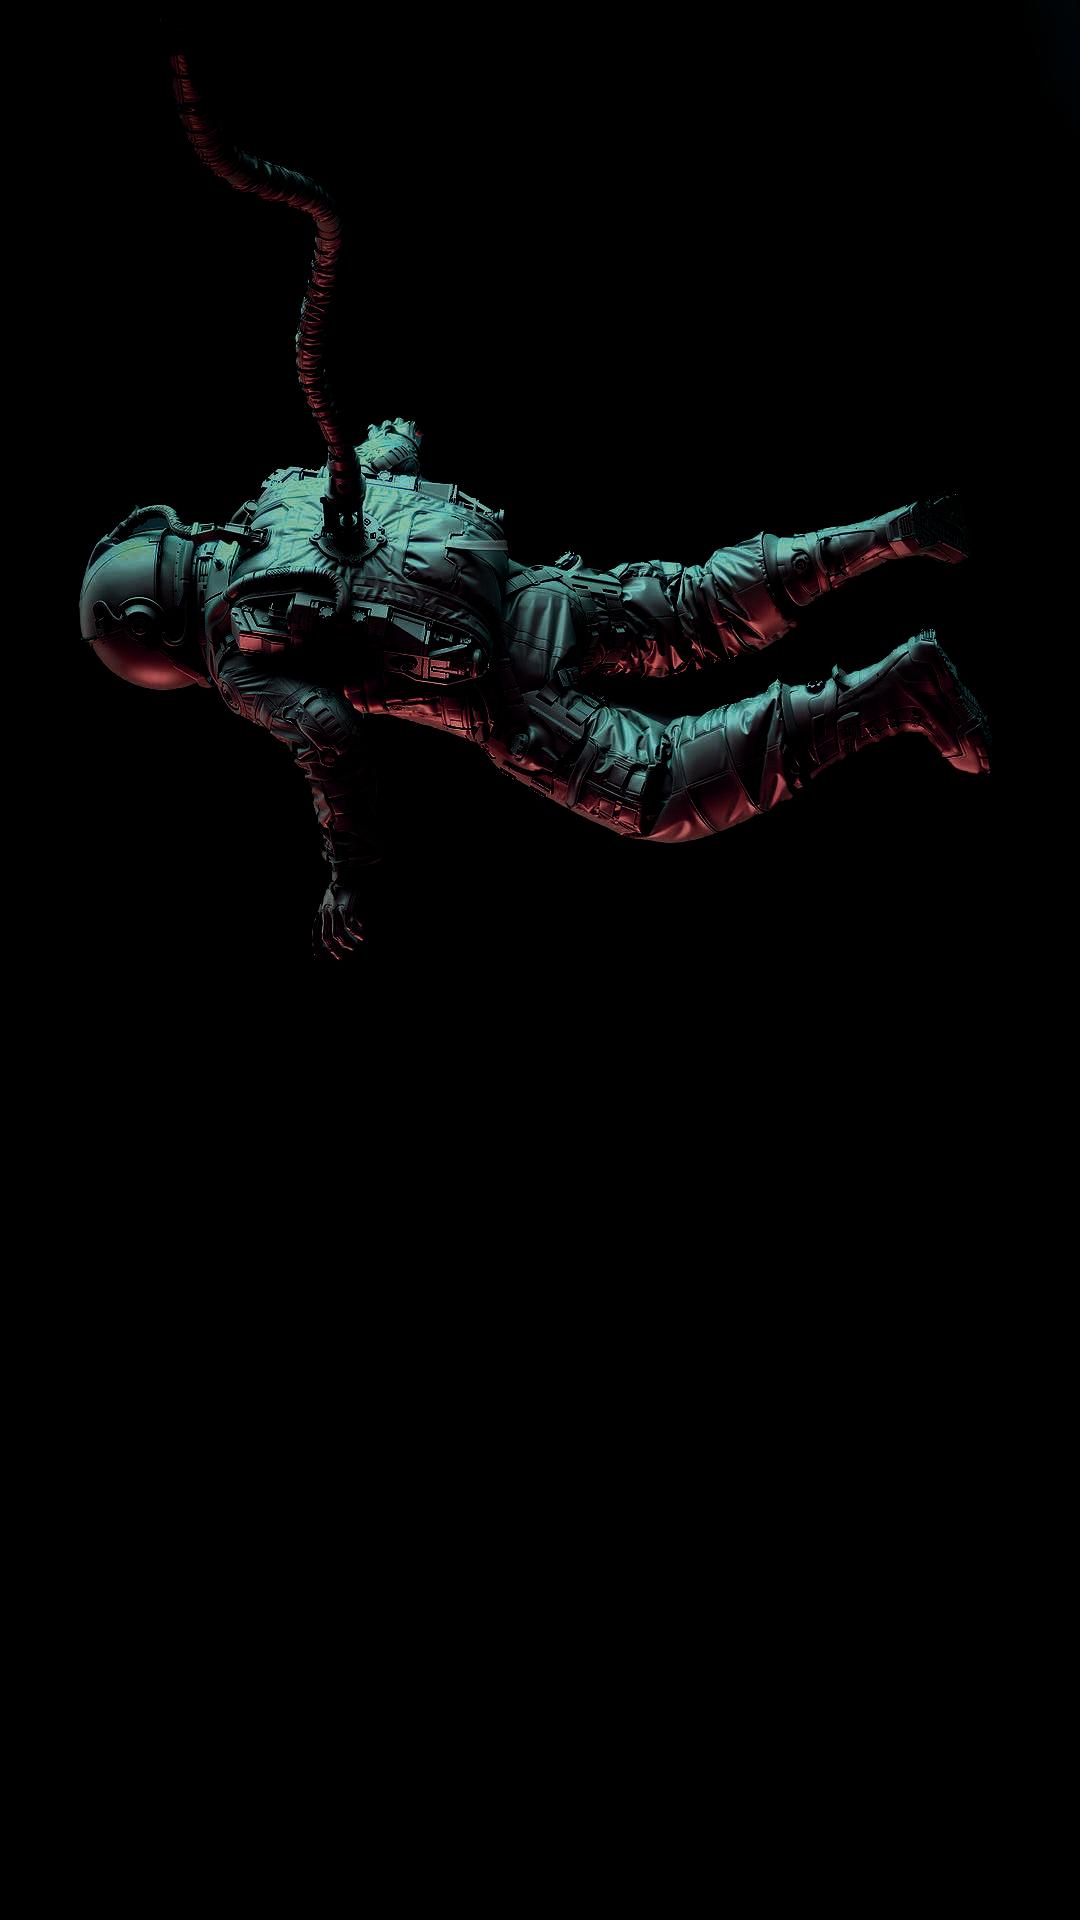 Astronaut amoled wallpaper Cool Wallpapers   heroscreencc 1080x1920